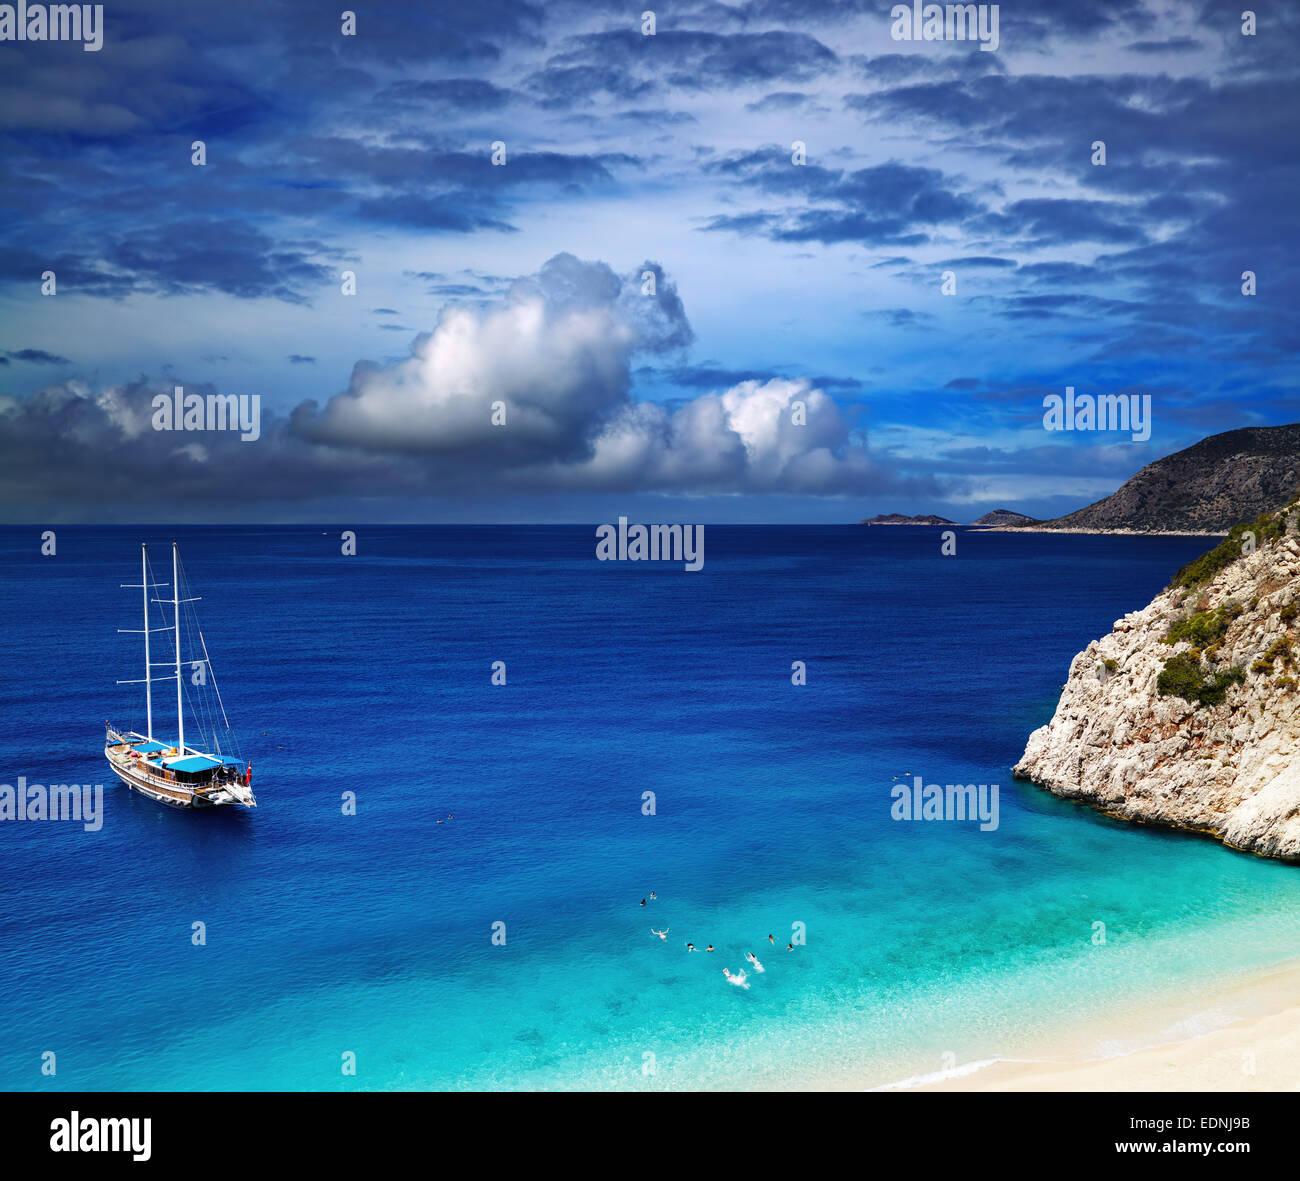 Playa Kaputas, Costa Mediterránea, Turquía Imagen De Stock